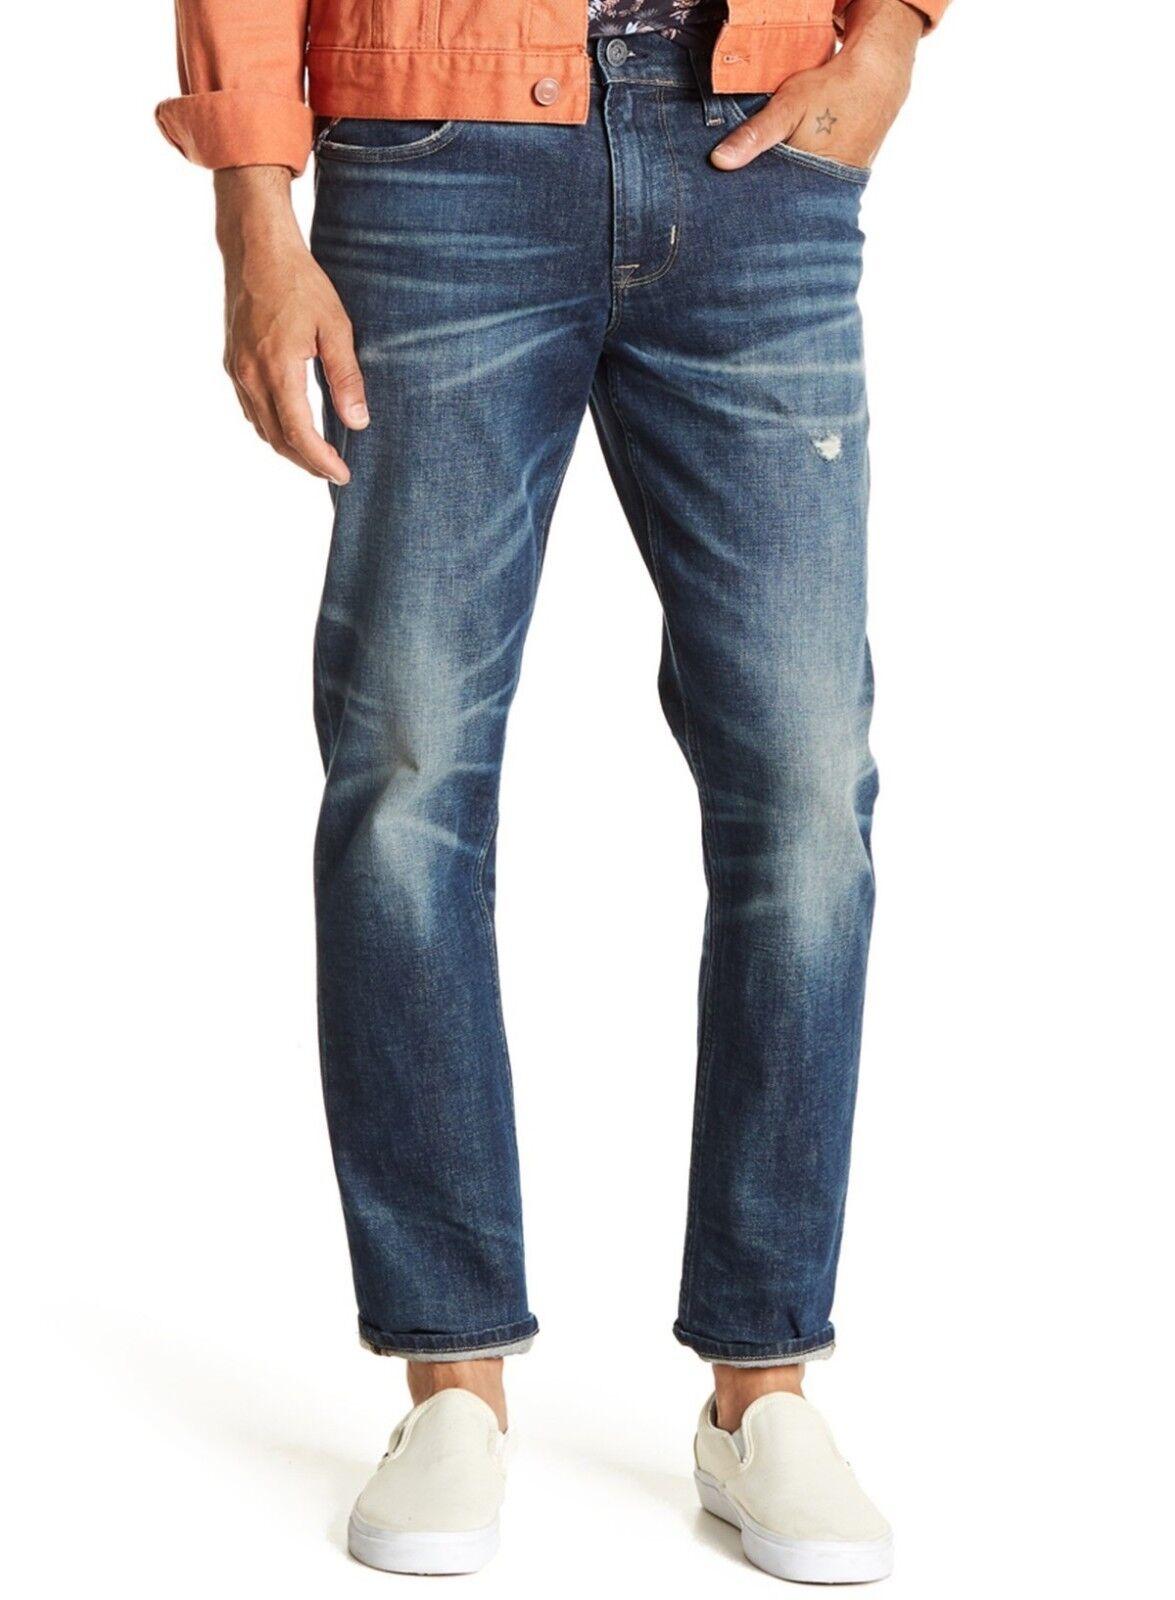 Hudson Jeans Men's Blake Slim Straight Leg Jeans Method Distressed OPER Denim